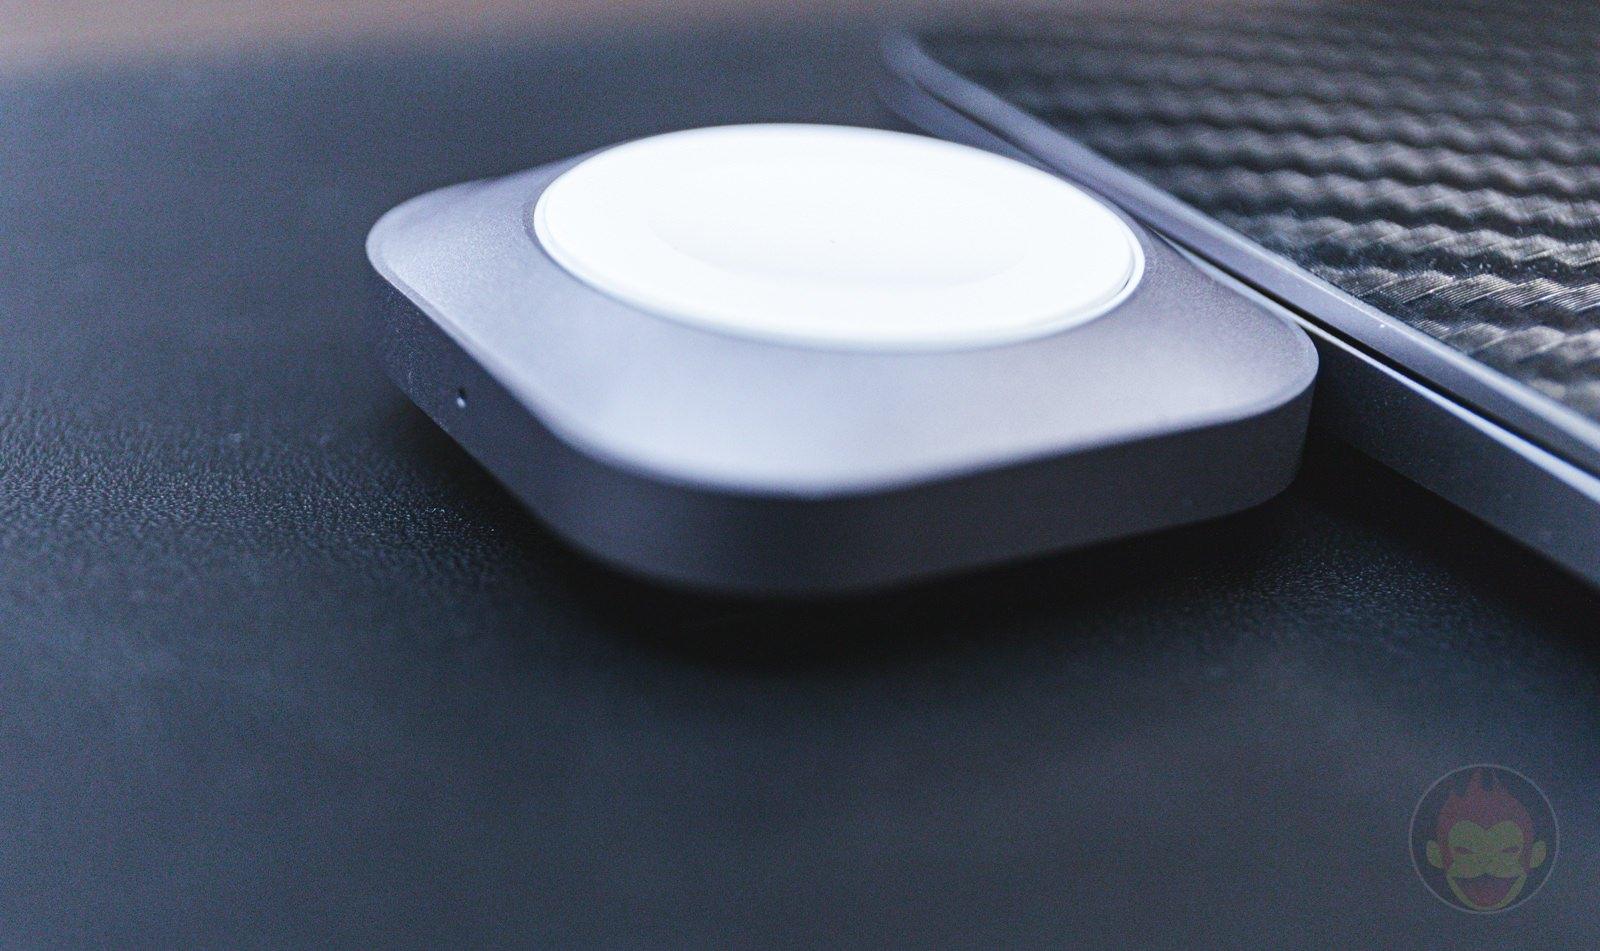 Satechi USB C Apple Watch Charging Dock 08